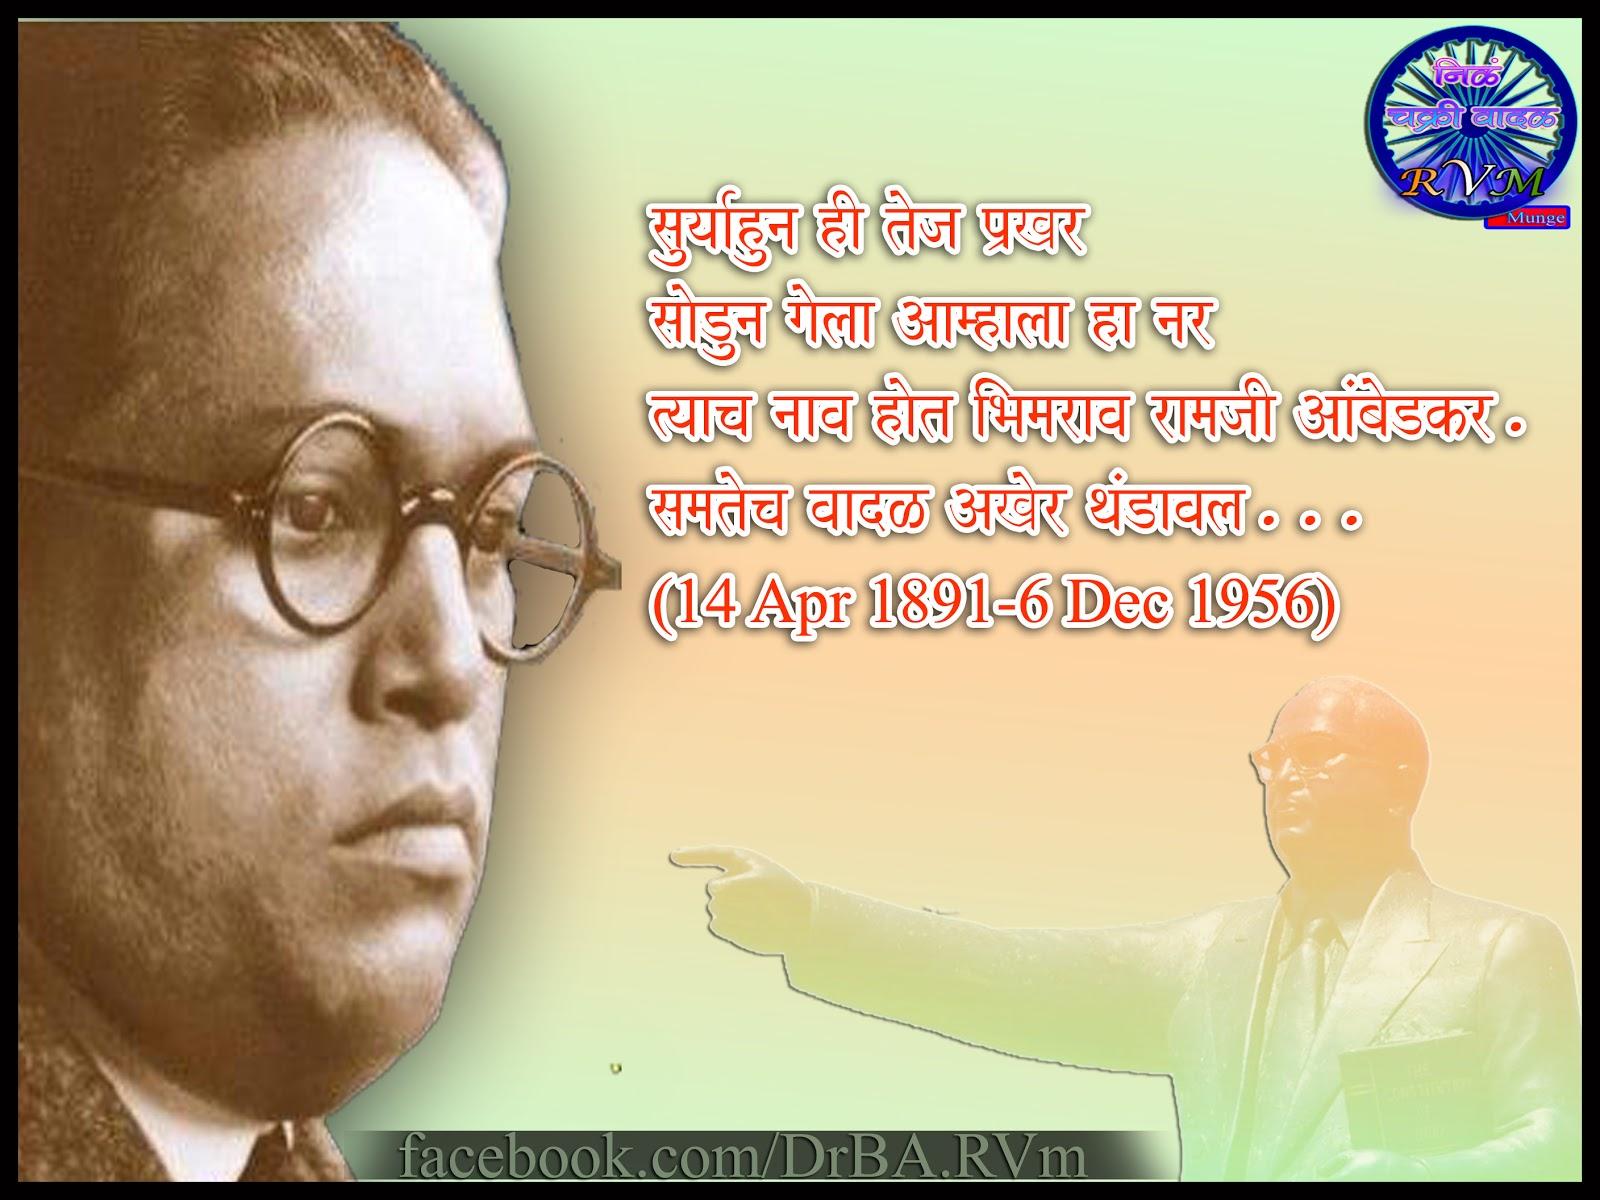 Dr.Babasaheb Ambedkar ( Bhimrao Ramji Ambedkar ): Mahaparinirvan Day Chaityabhoomi Dadar Mumbai ...